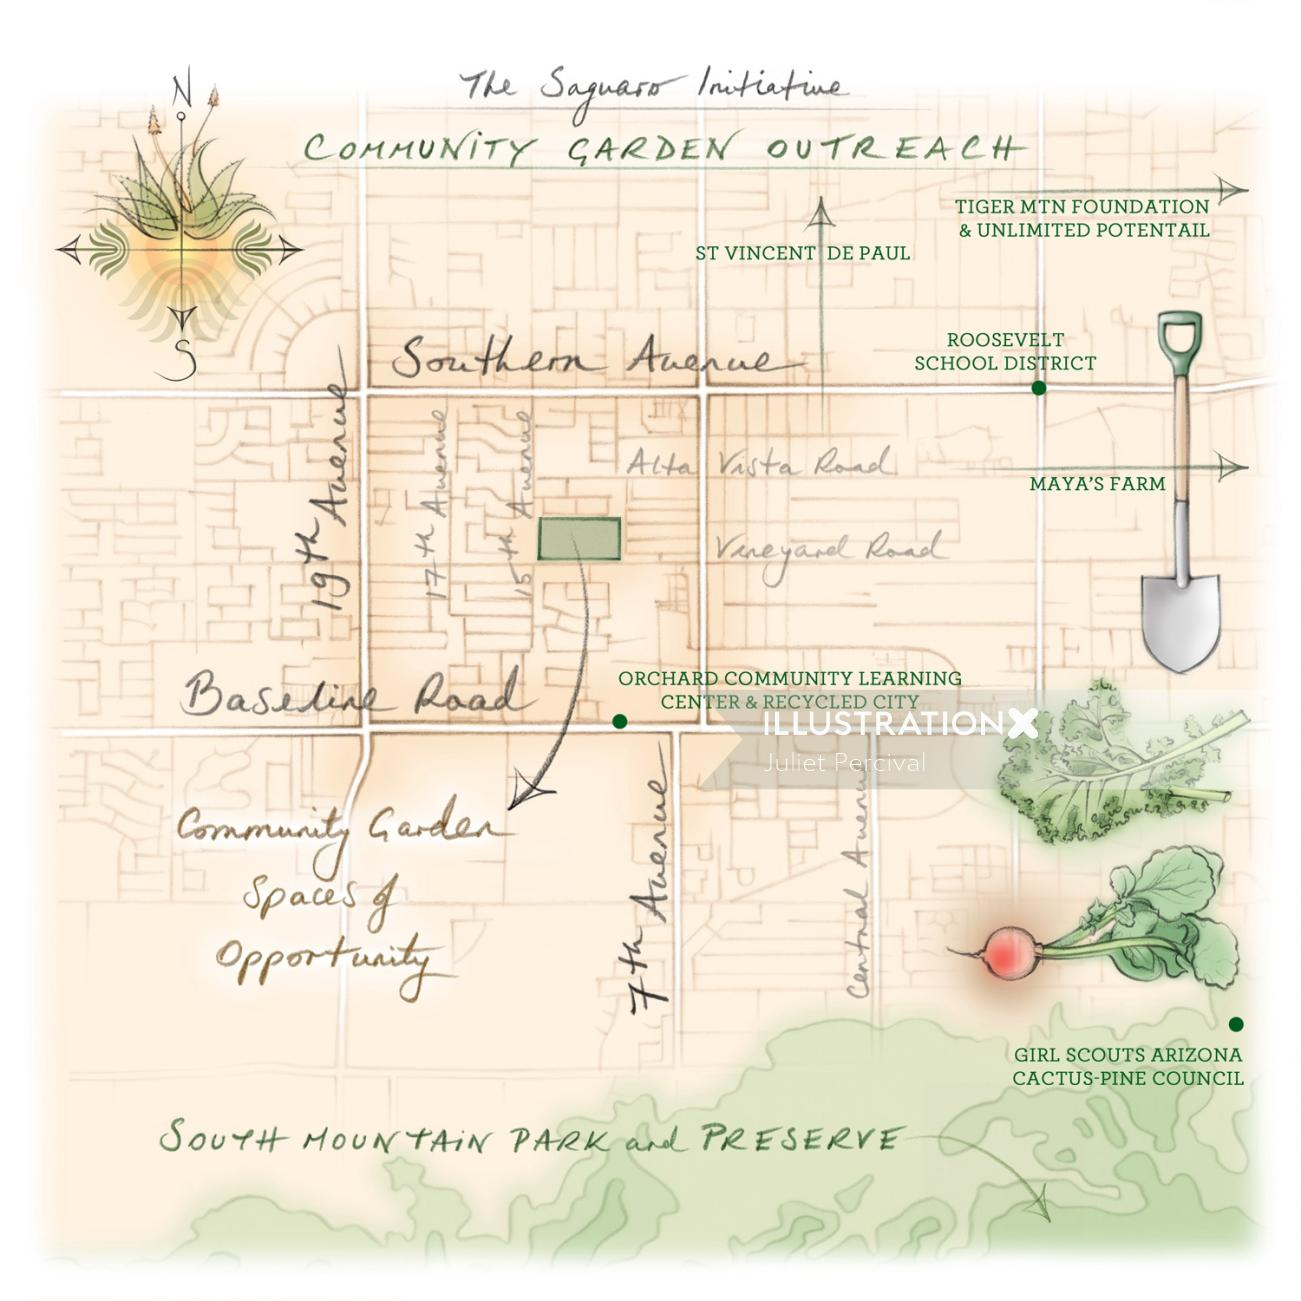 Botanical garden, Arizona, South Mountain Park, spade, radish, allotments, street map, horticulture